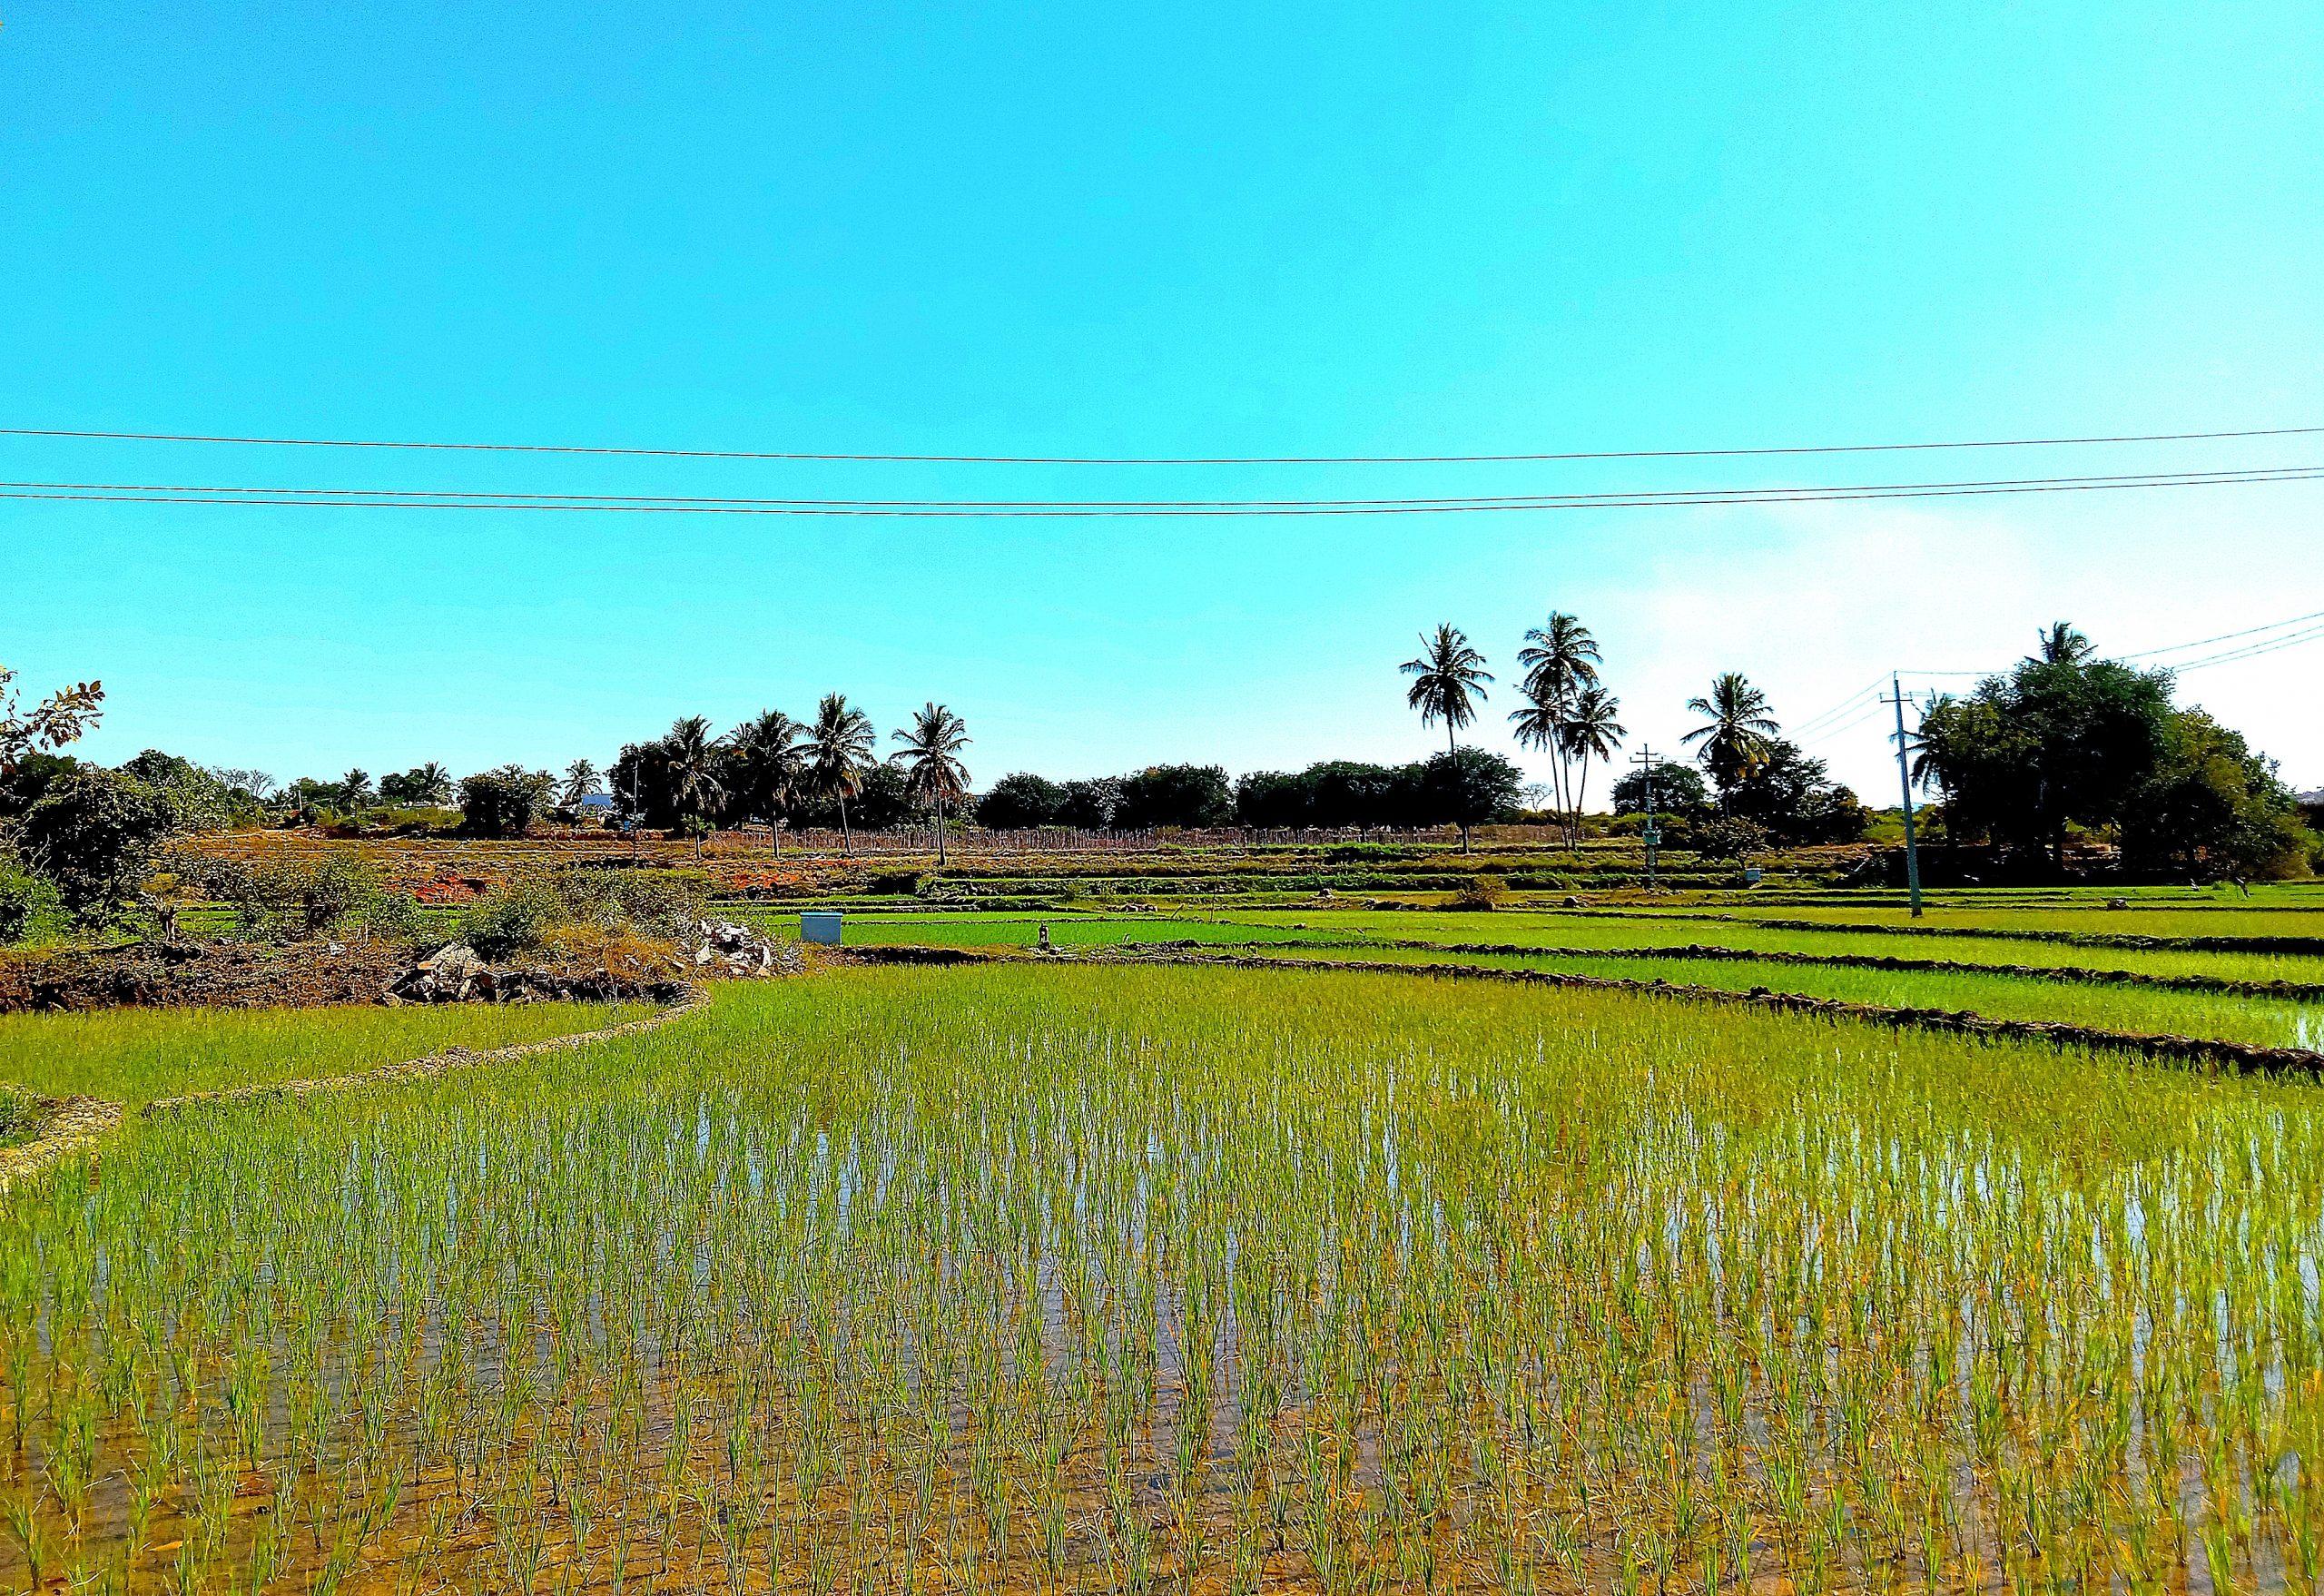 Water in the crop in farm